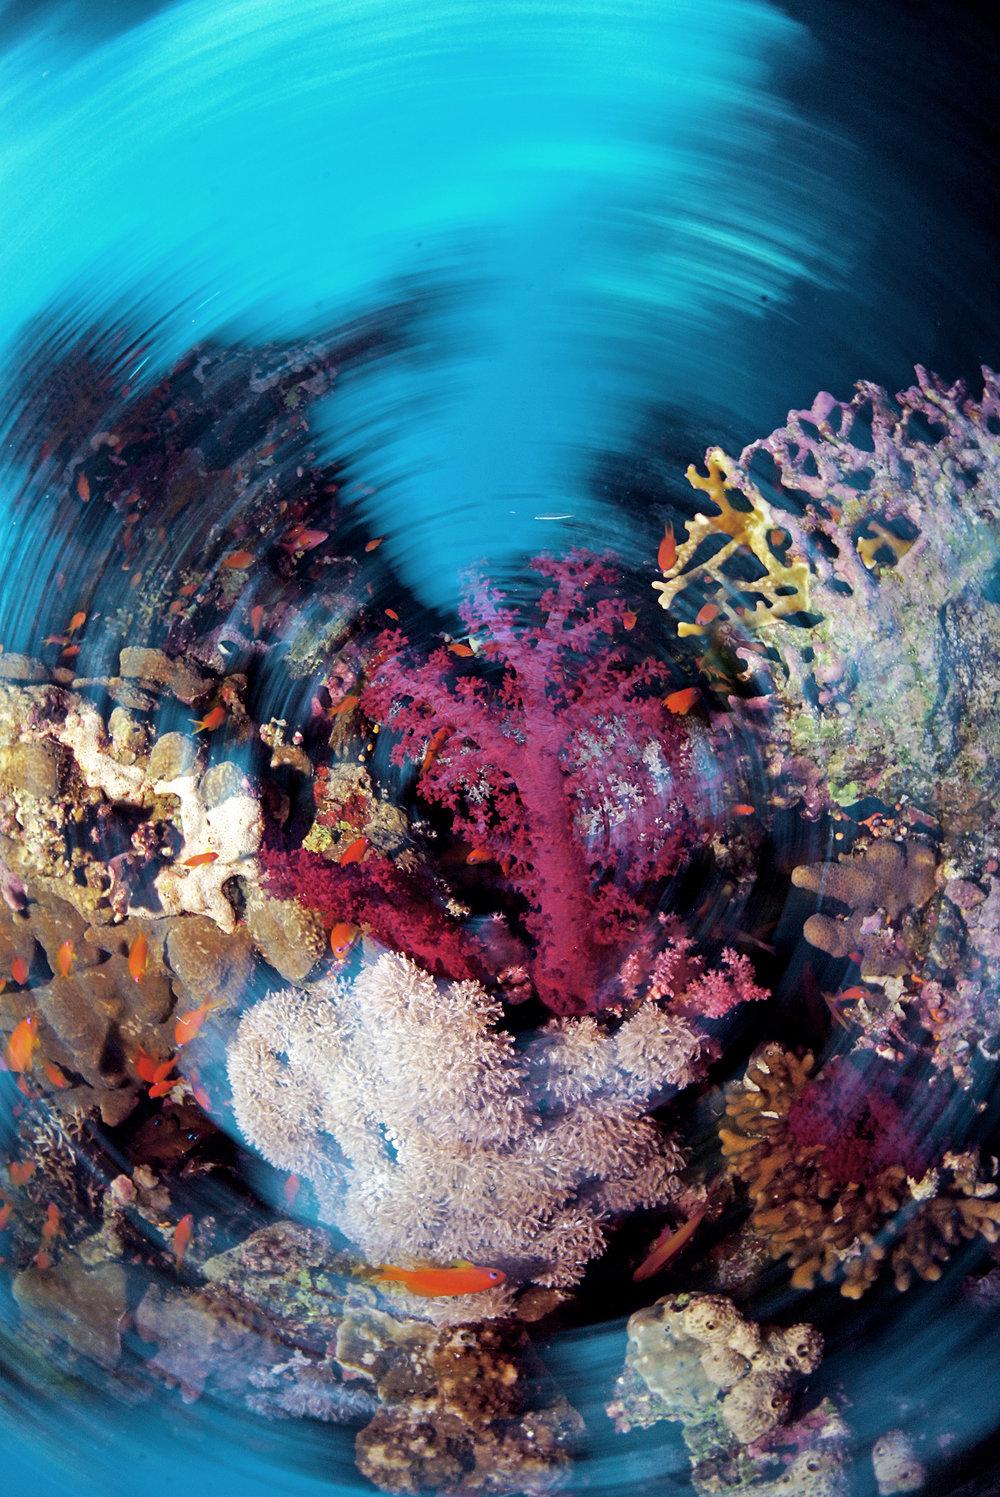 spinning corals CRedit: Cinzia Osele Bismarck/ coral reef image bank